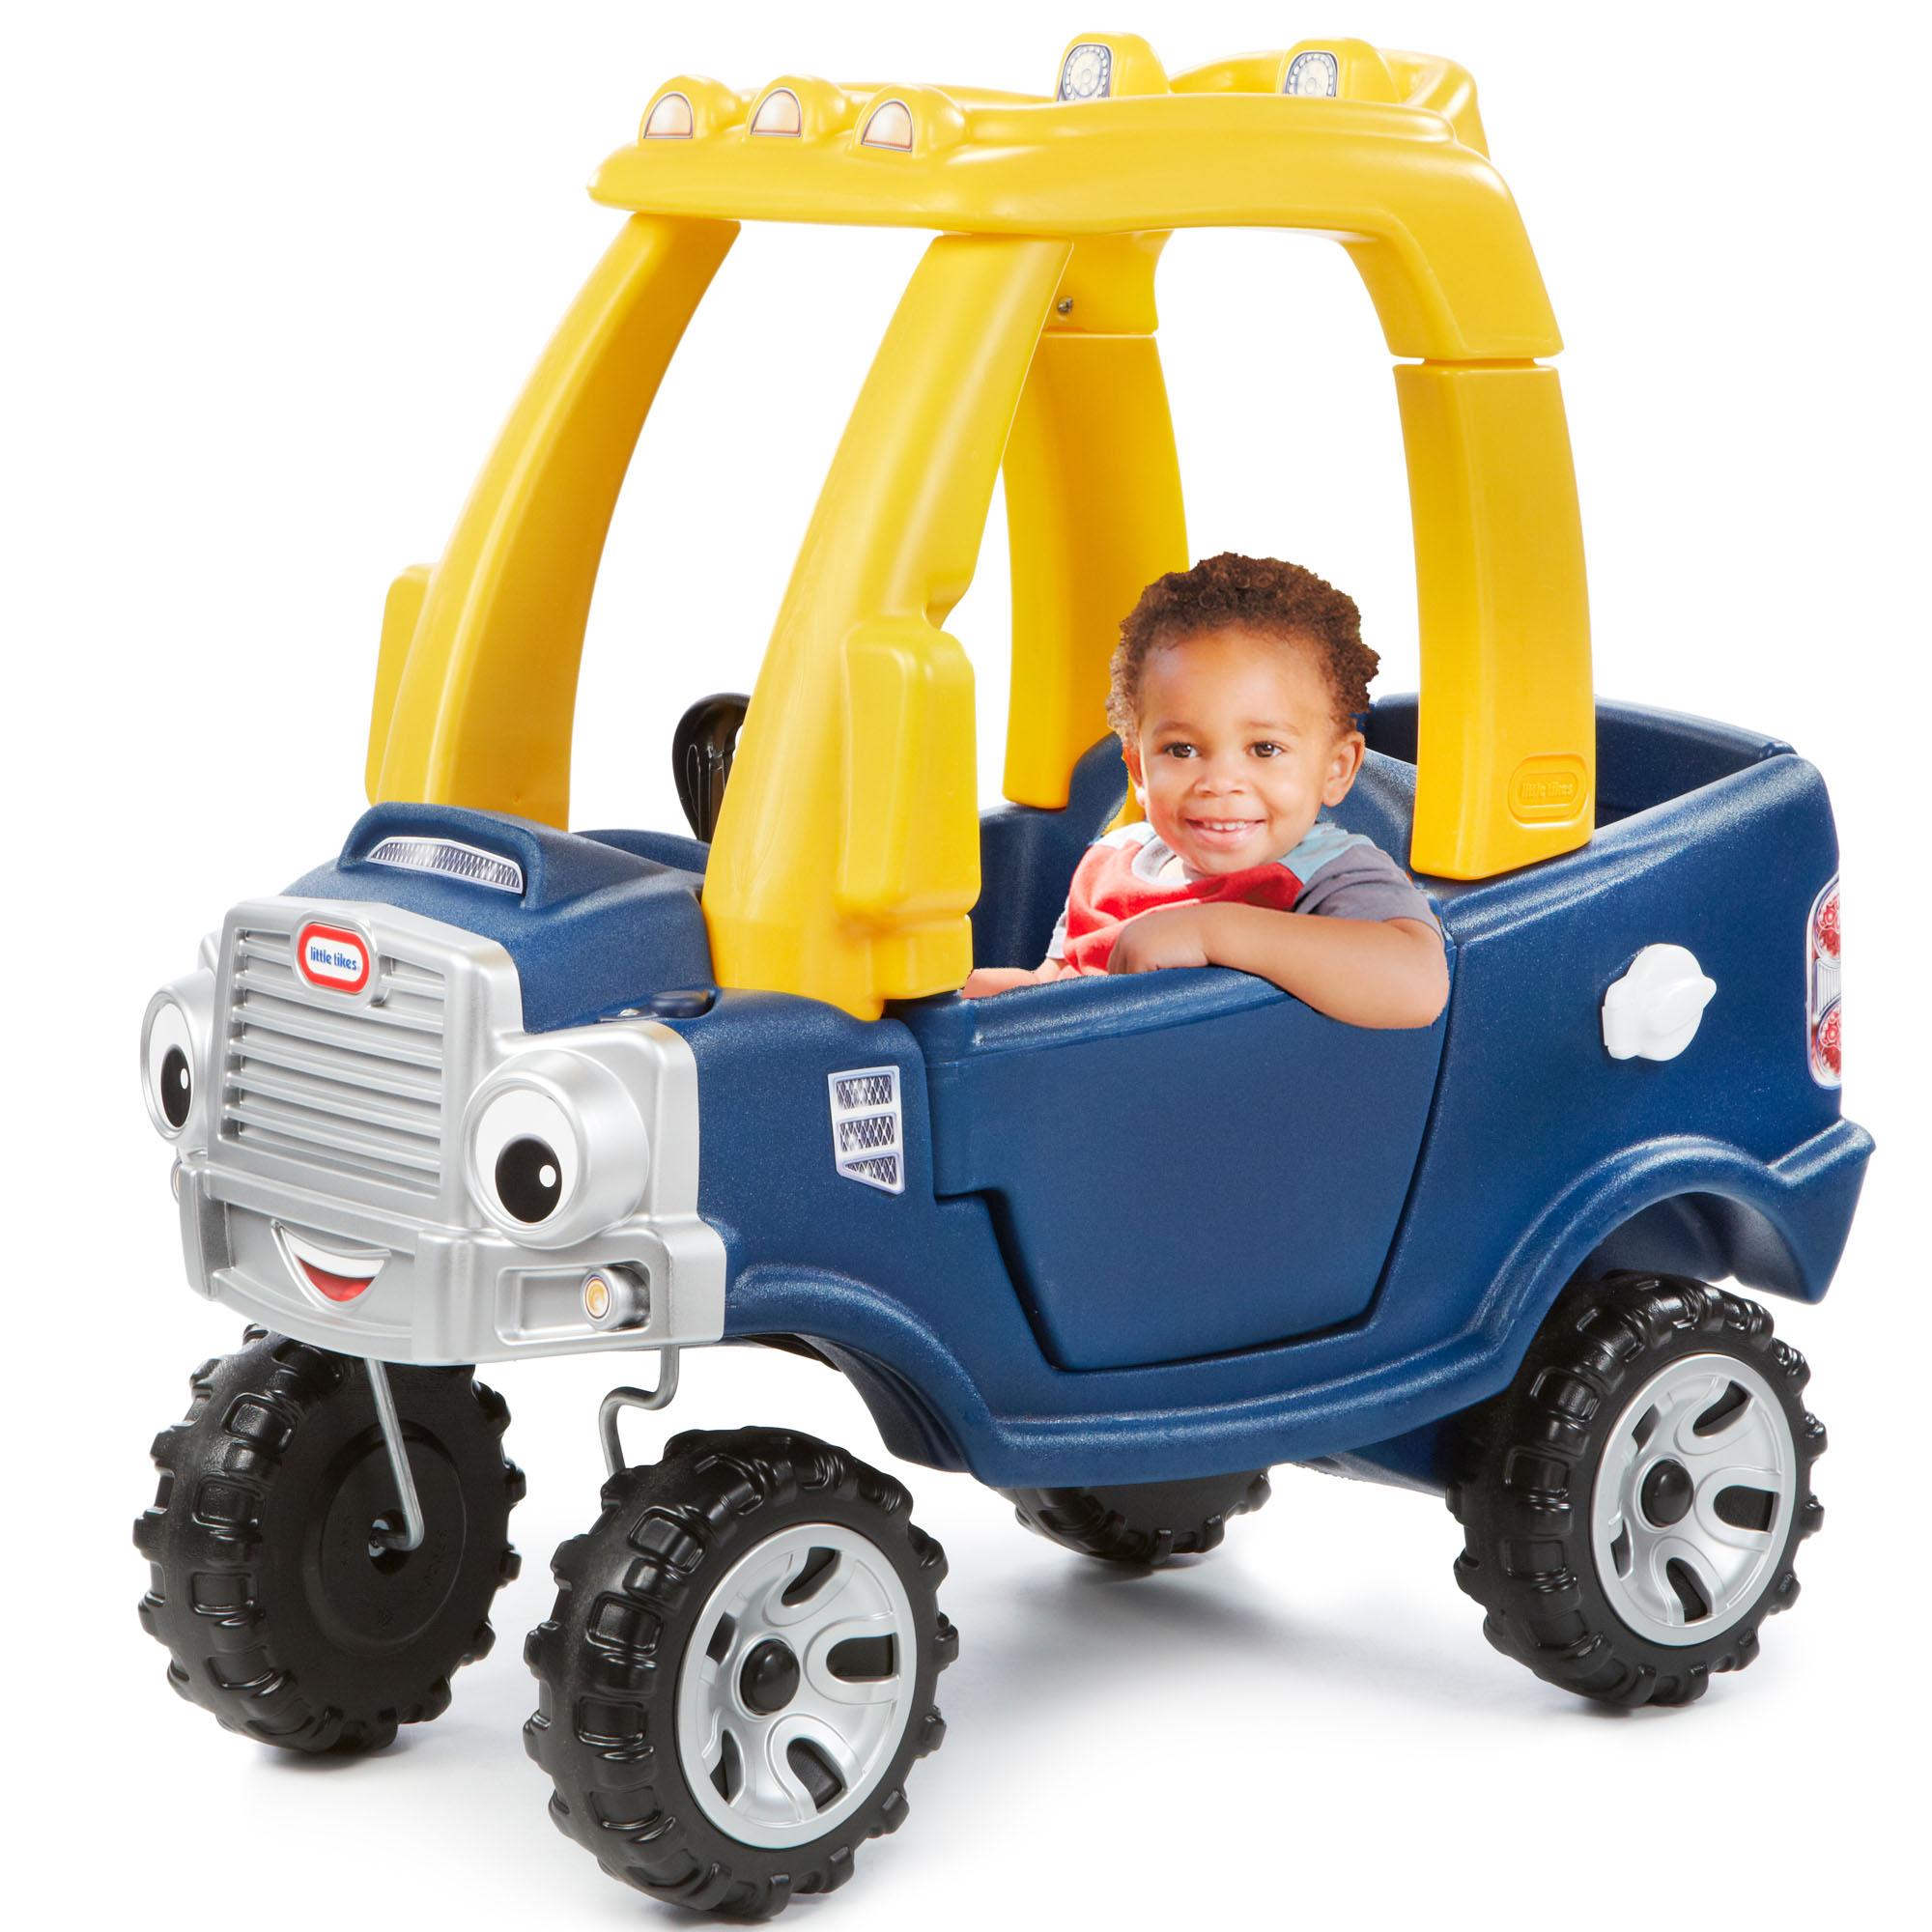 Little Tikes Cozy Truck or Princess Cozy Truck Walmart Store Clearance YMMV B&M $29